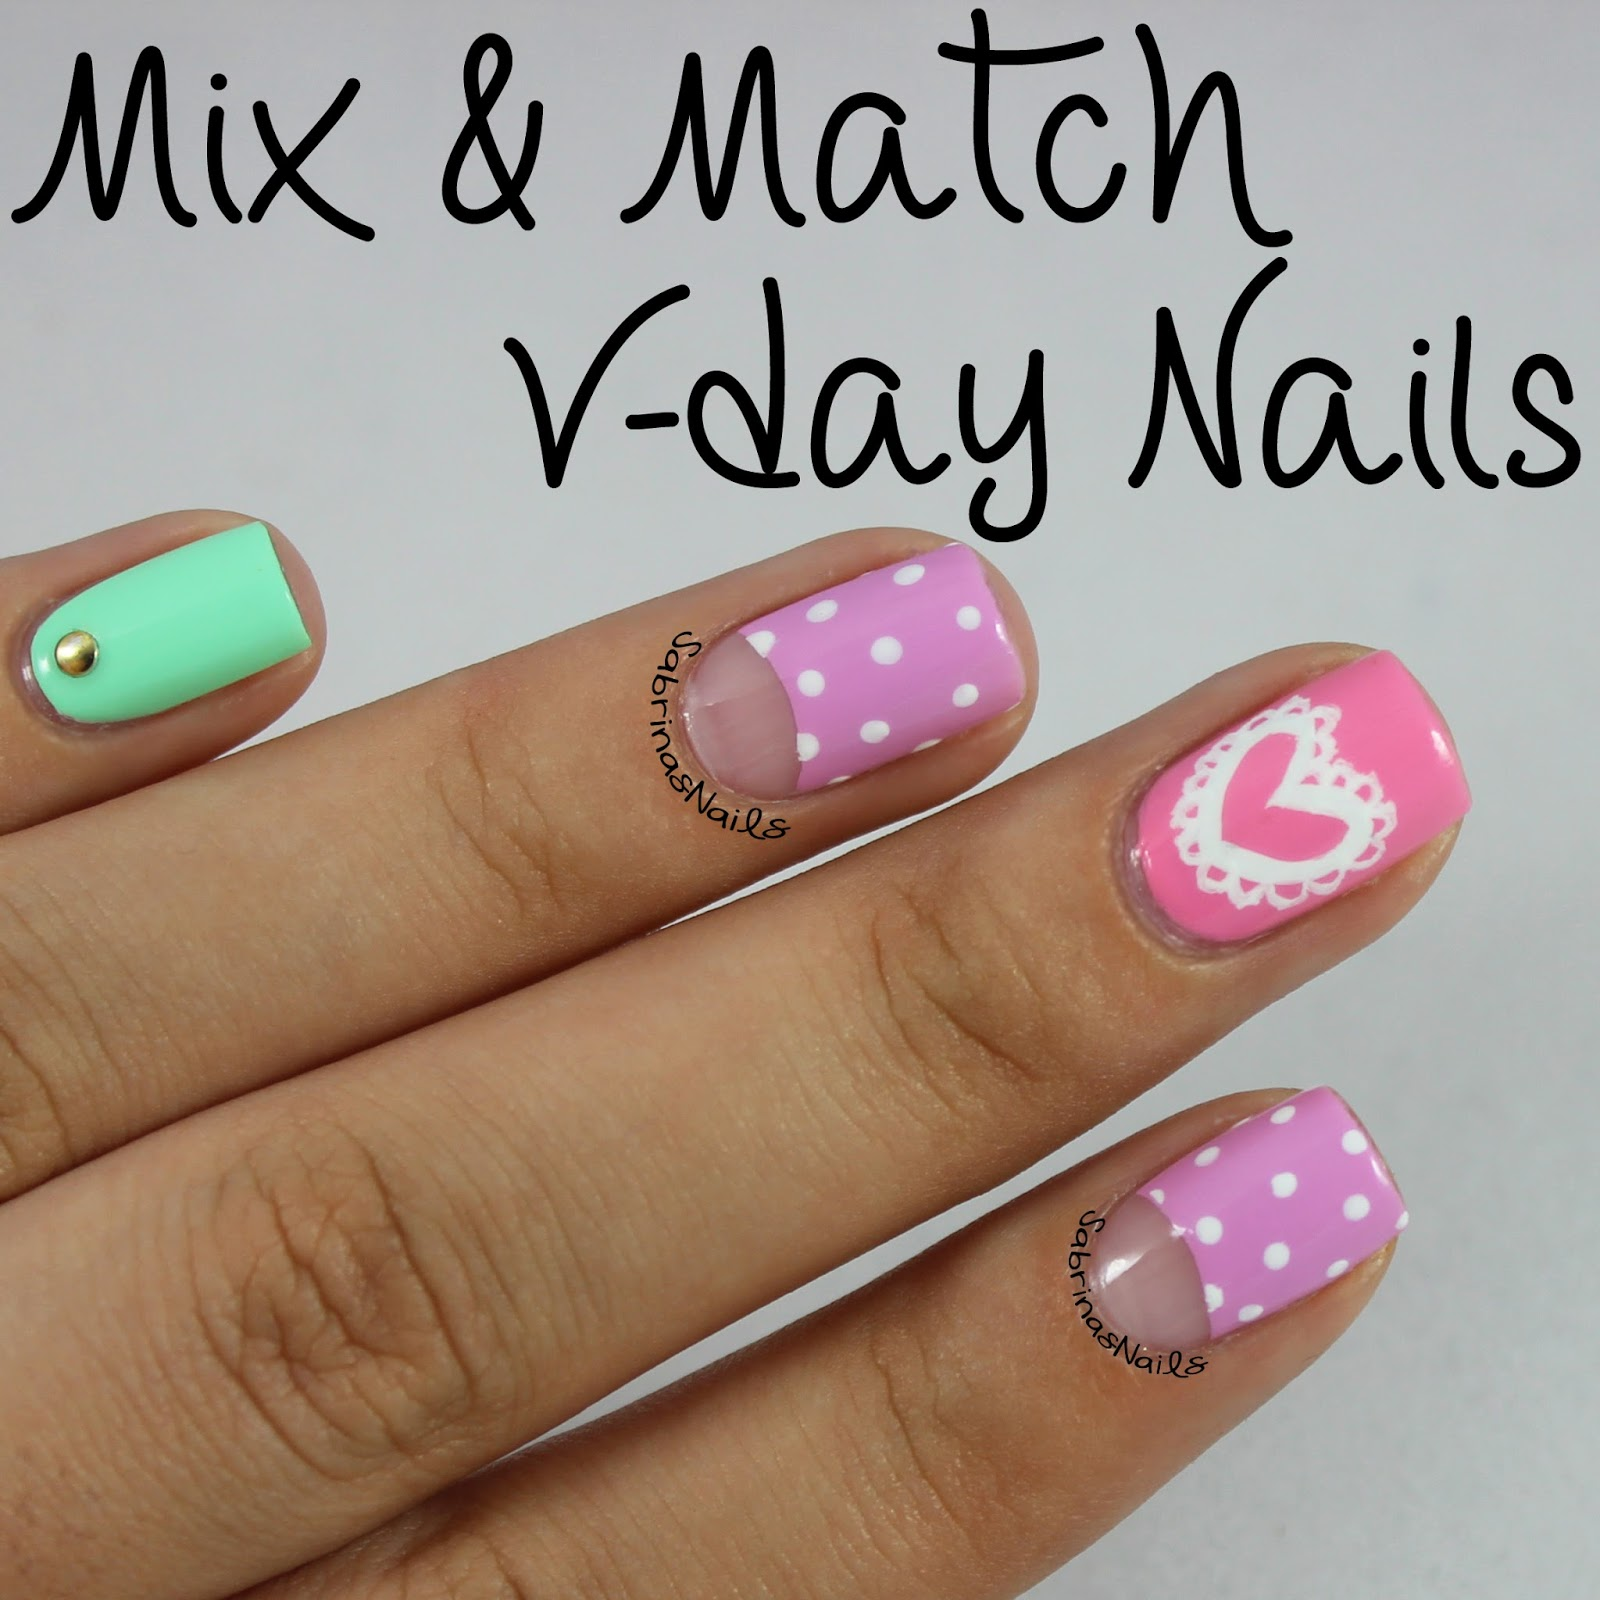 sabrinas nails mix match valentines day nails. Black Bedroom Furniture Sets. Home Design Ideas